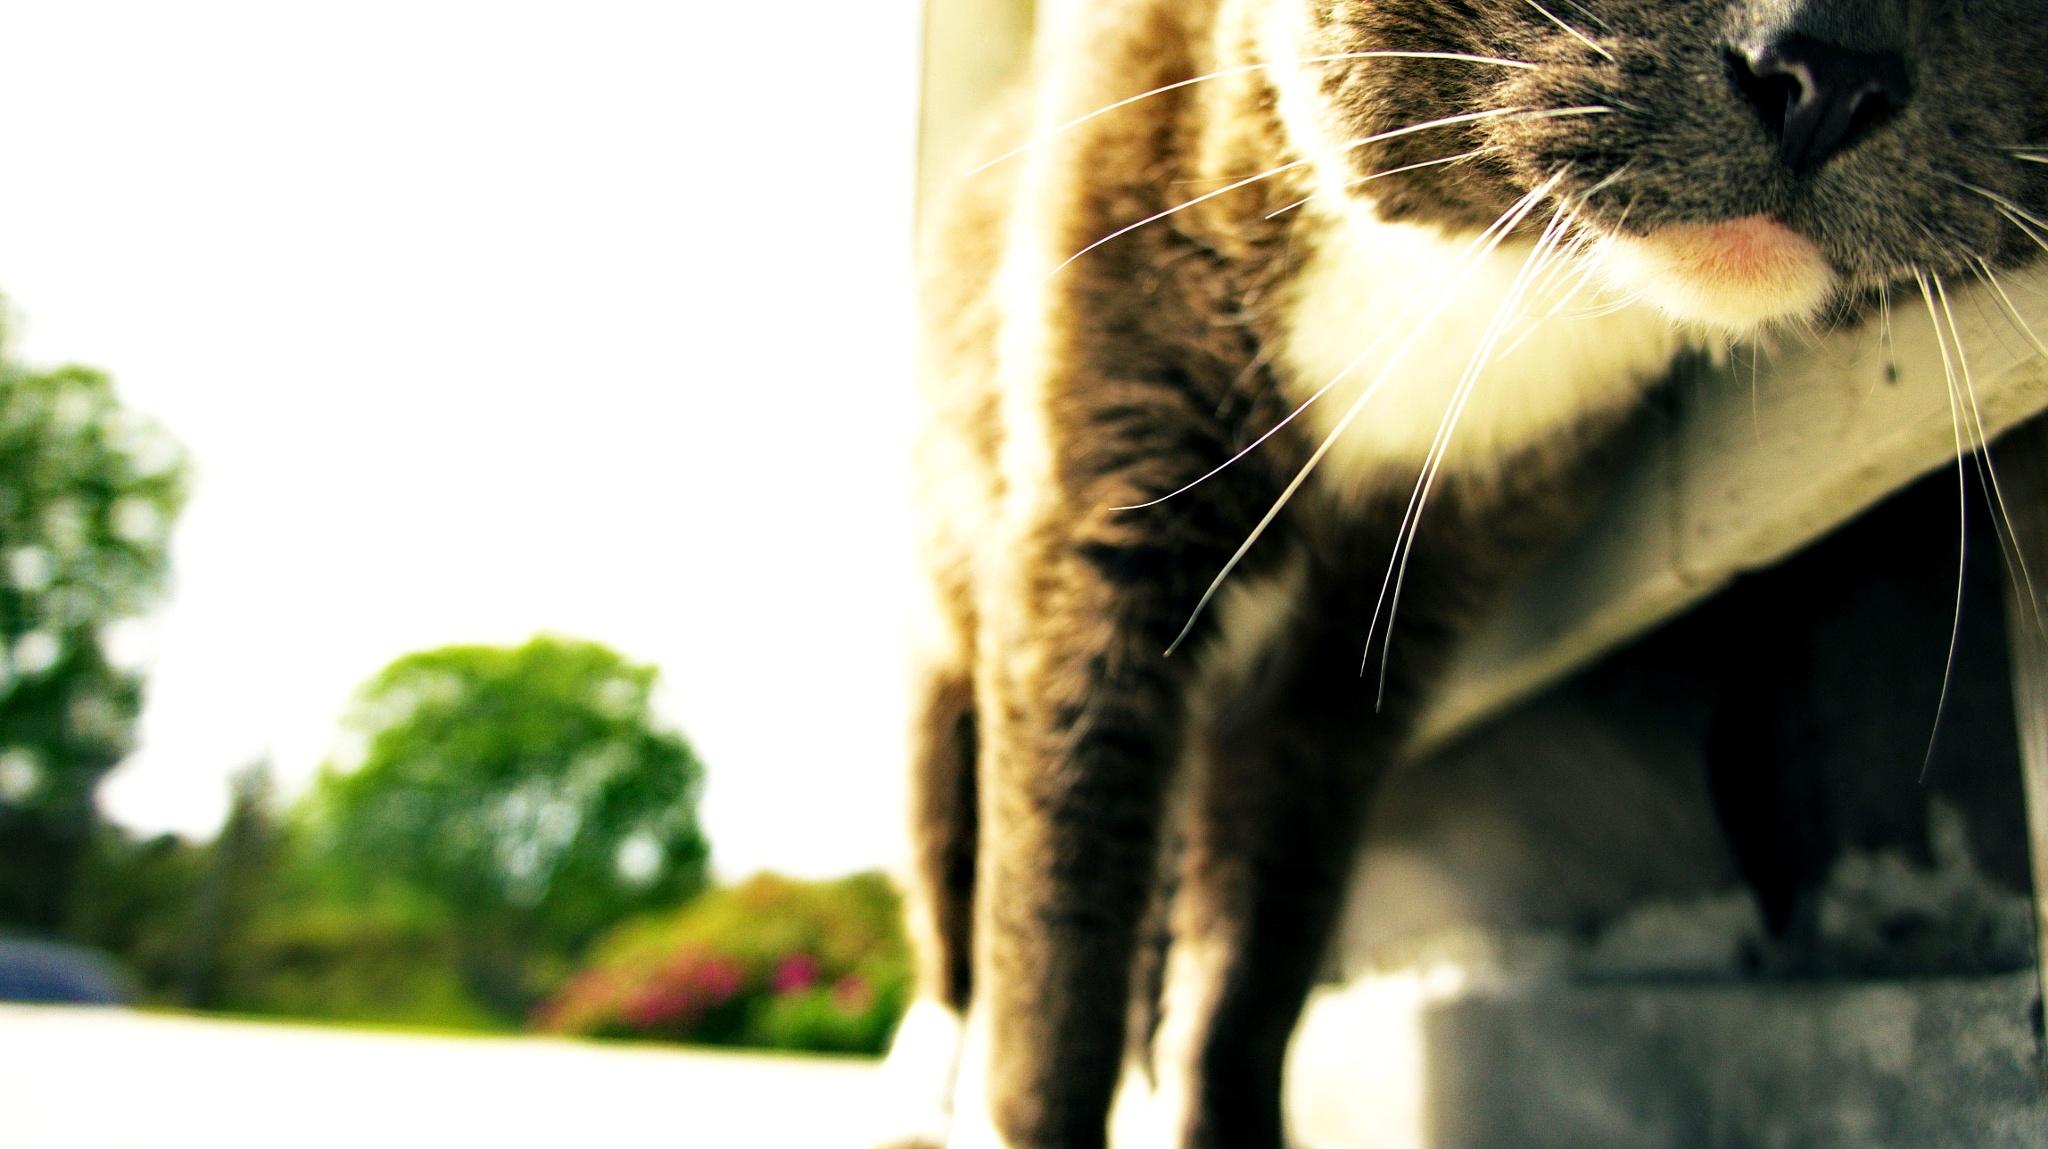 cat's mustache by LBoro